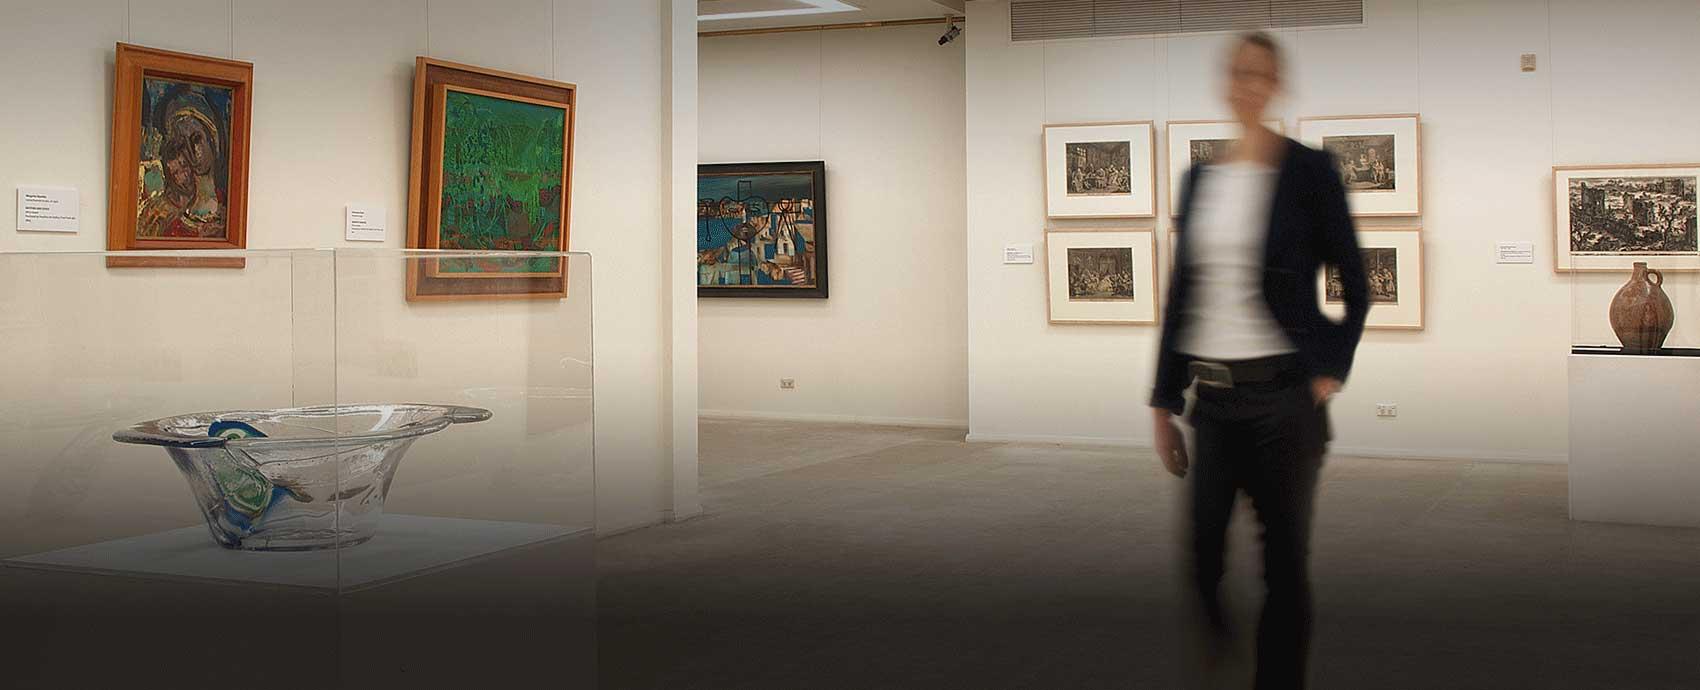 Art Gallery in Greater Hamilton